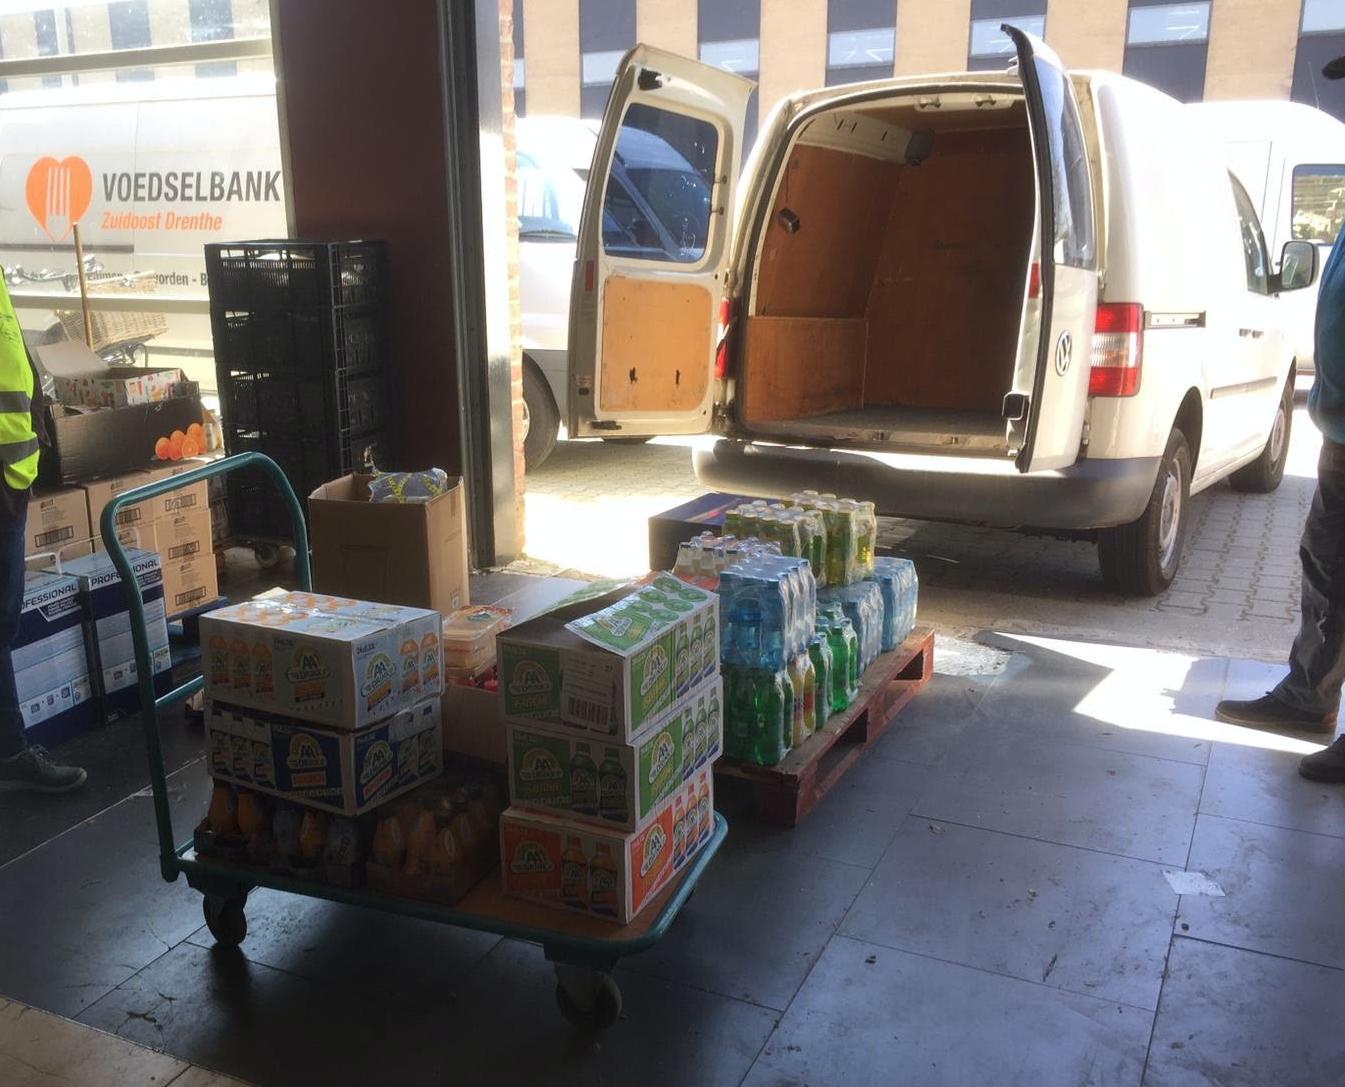 SVBO doneert kantinevoorraad aan Voedselbank